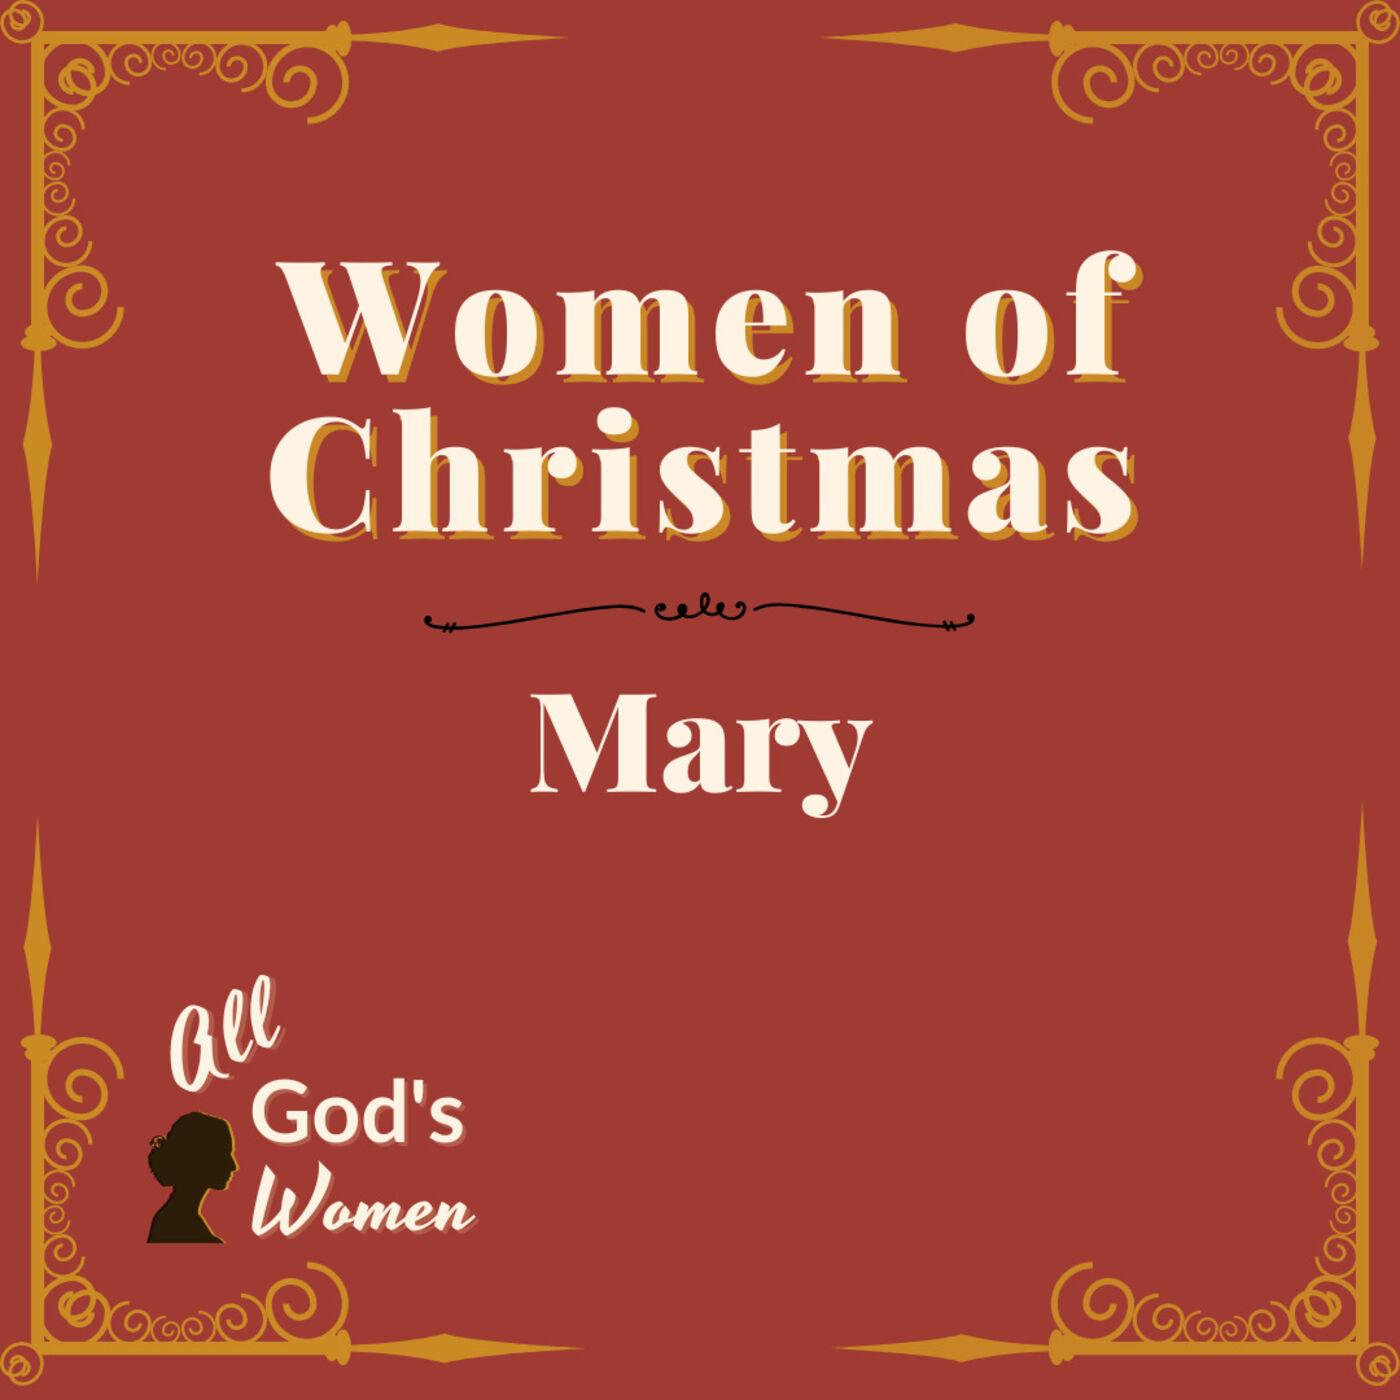 Women of Christmas - Mary